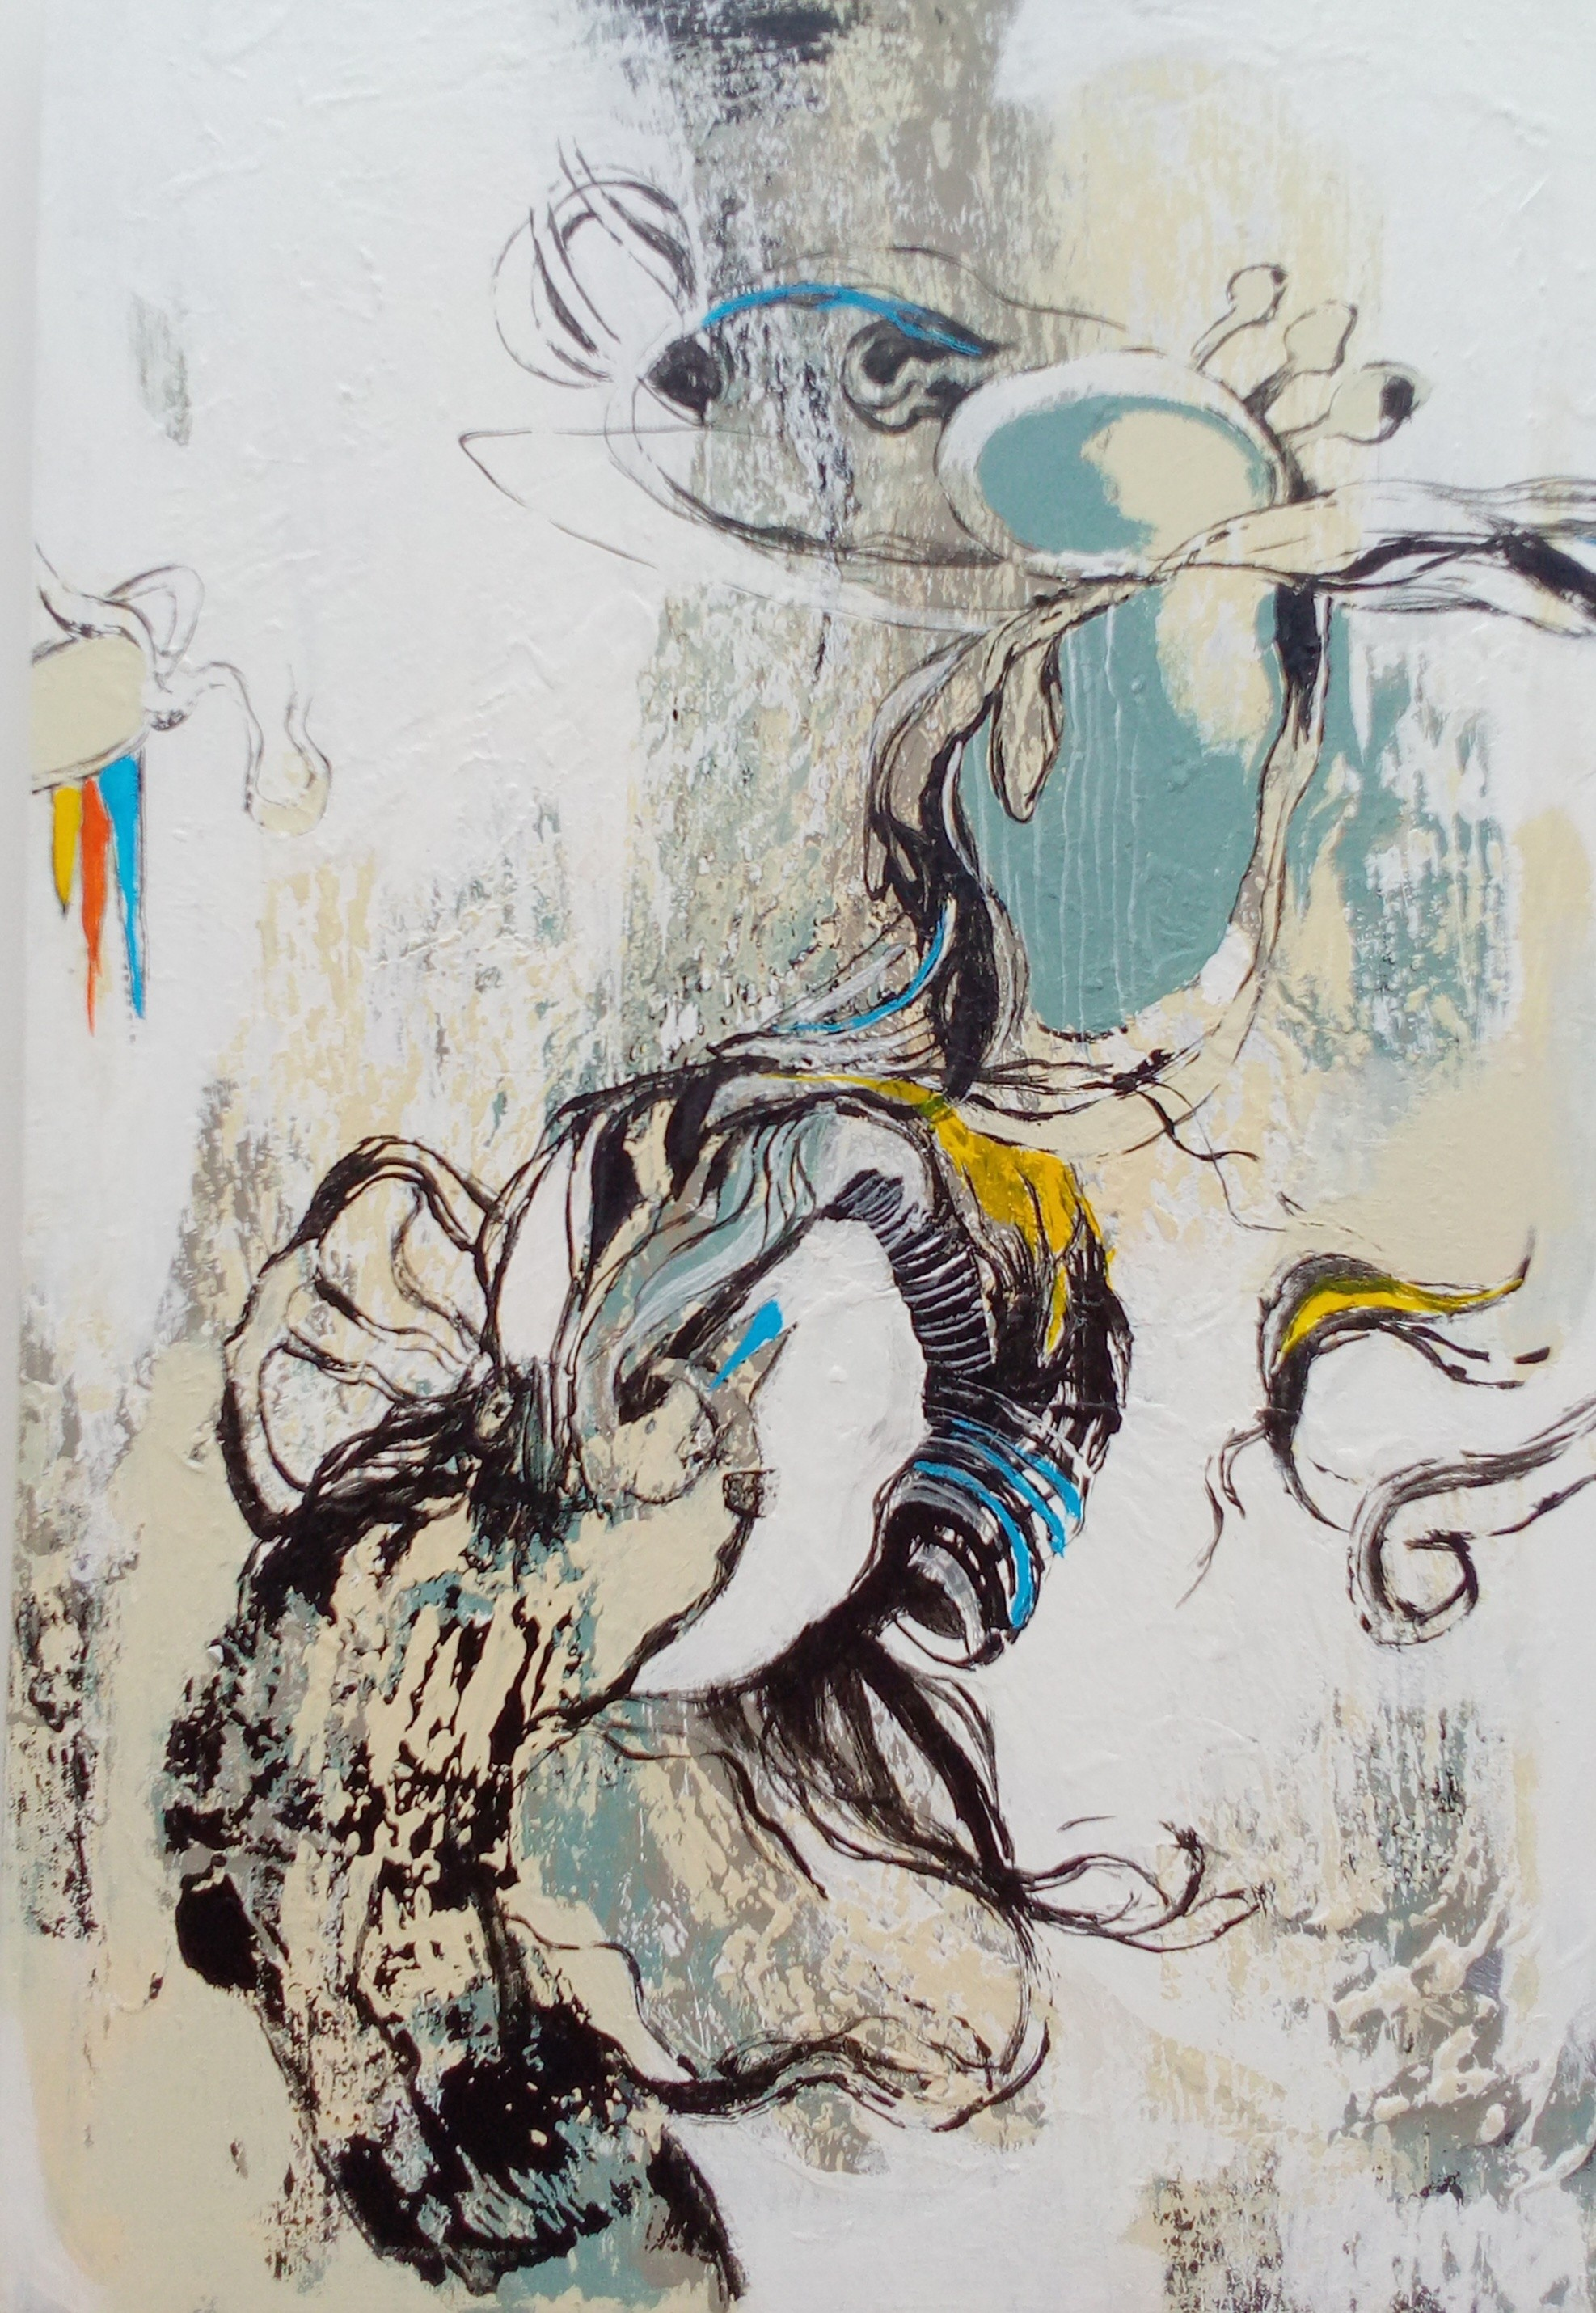 Moods -1 by Sanjeewa Gunasinghe